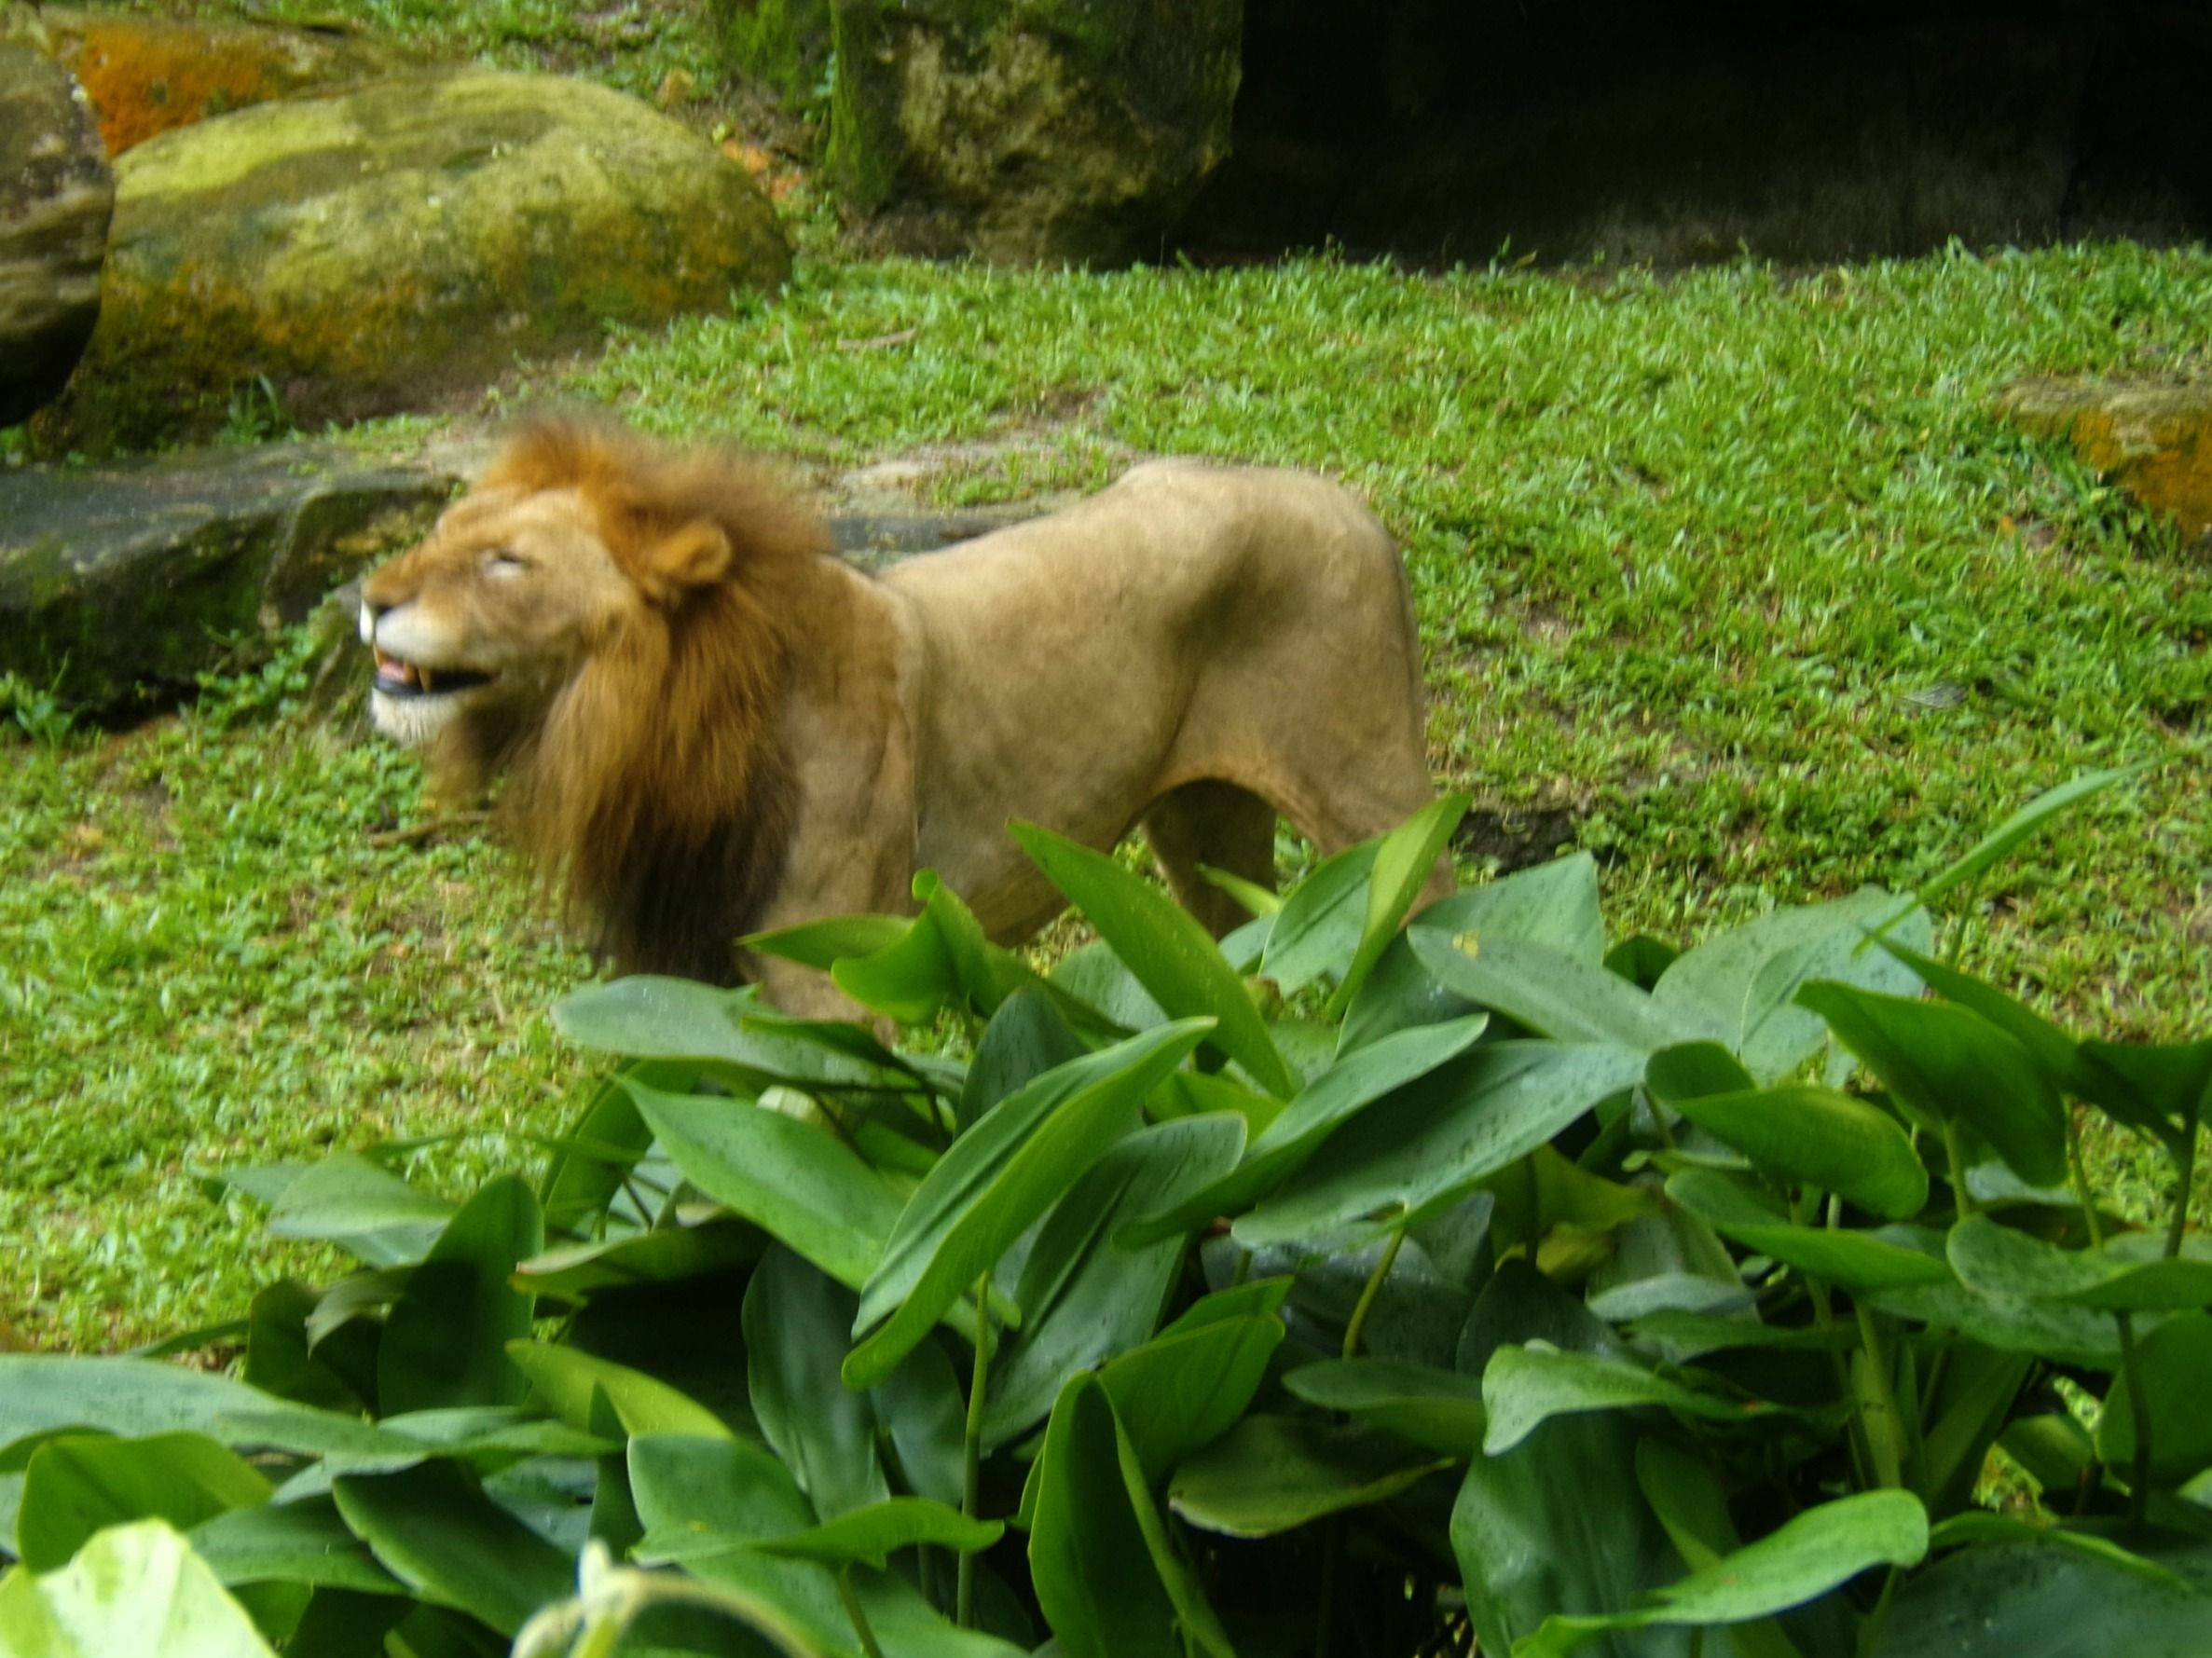 Smiling lion #candid #lion #smile #singaporezoo